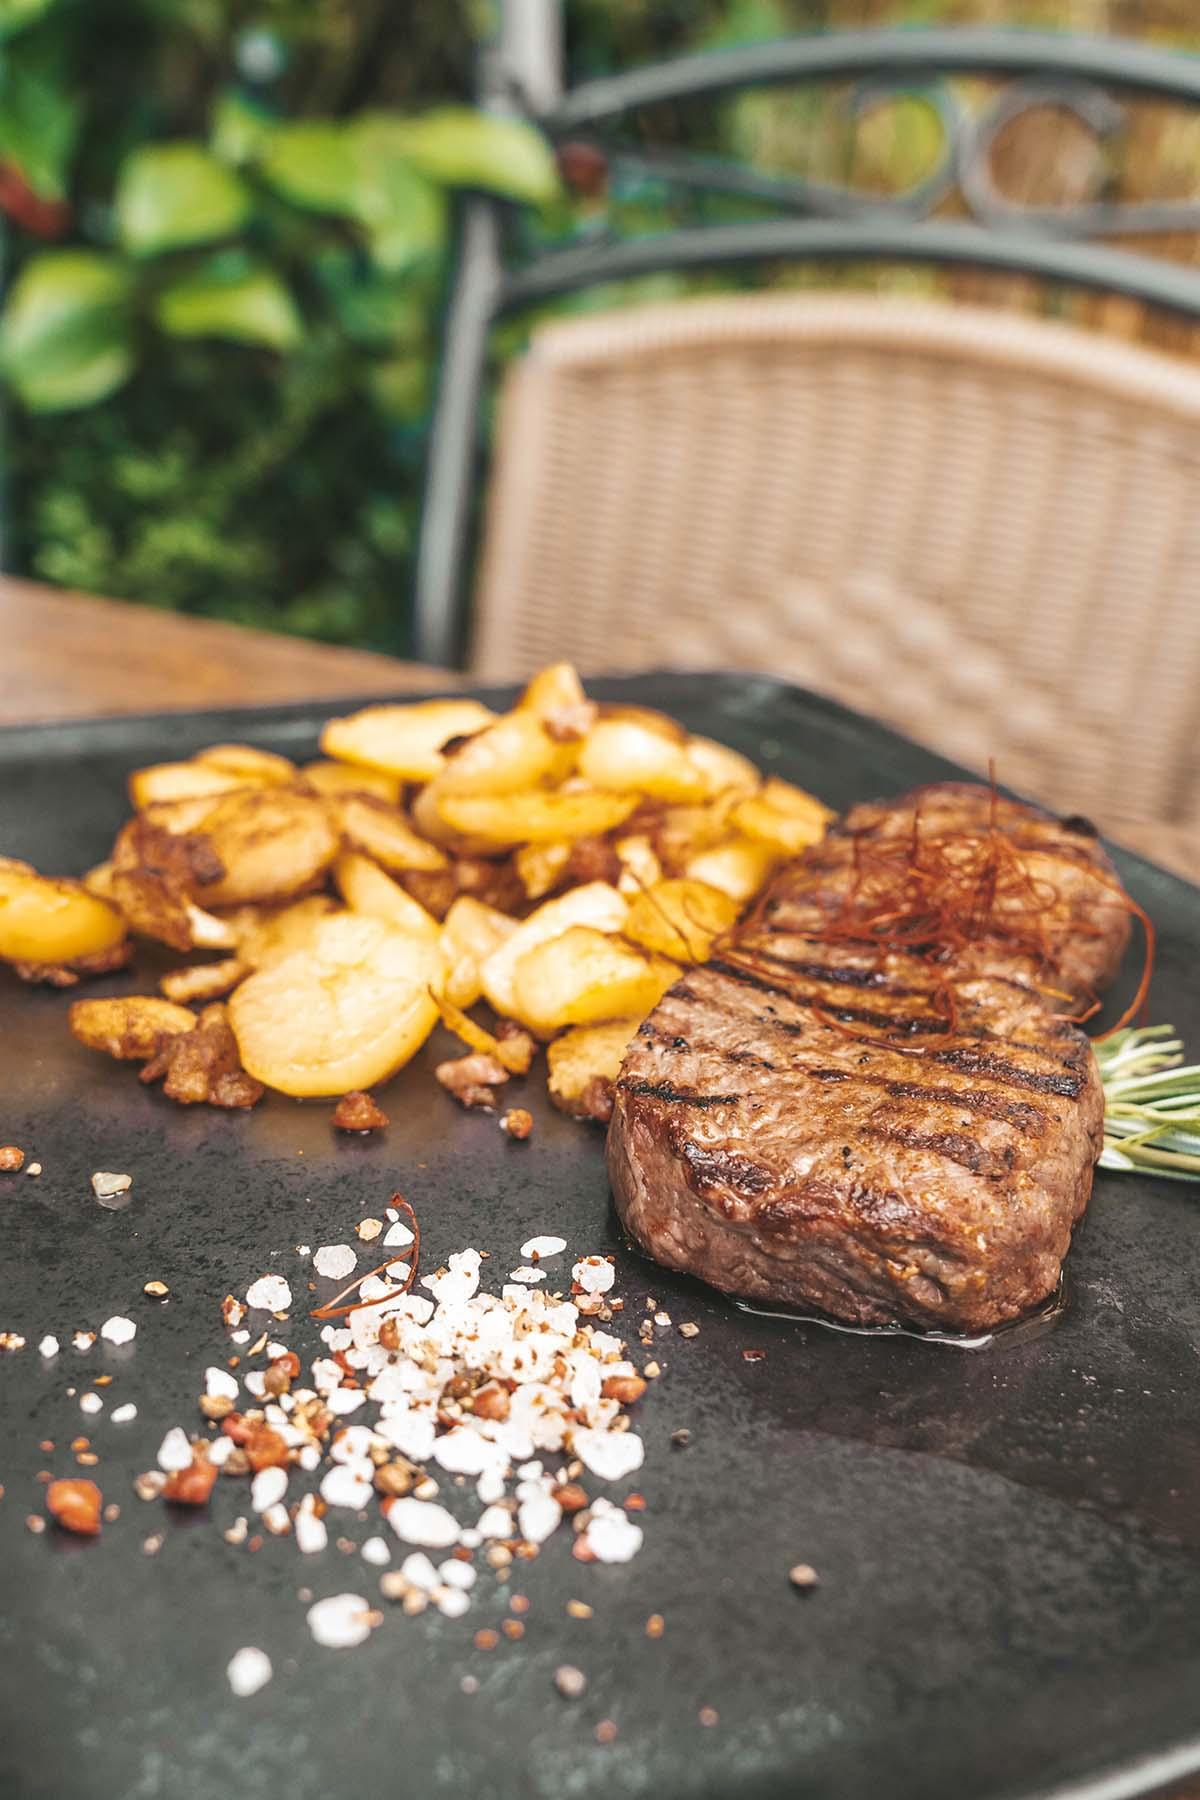 amrum-insel-urlaub-friedrichs-steak